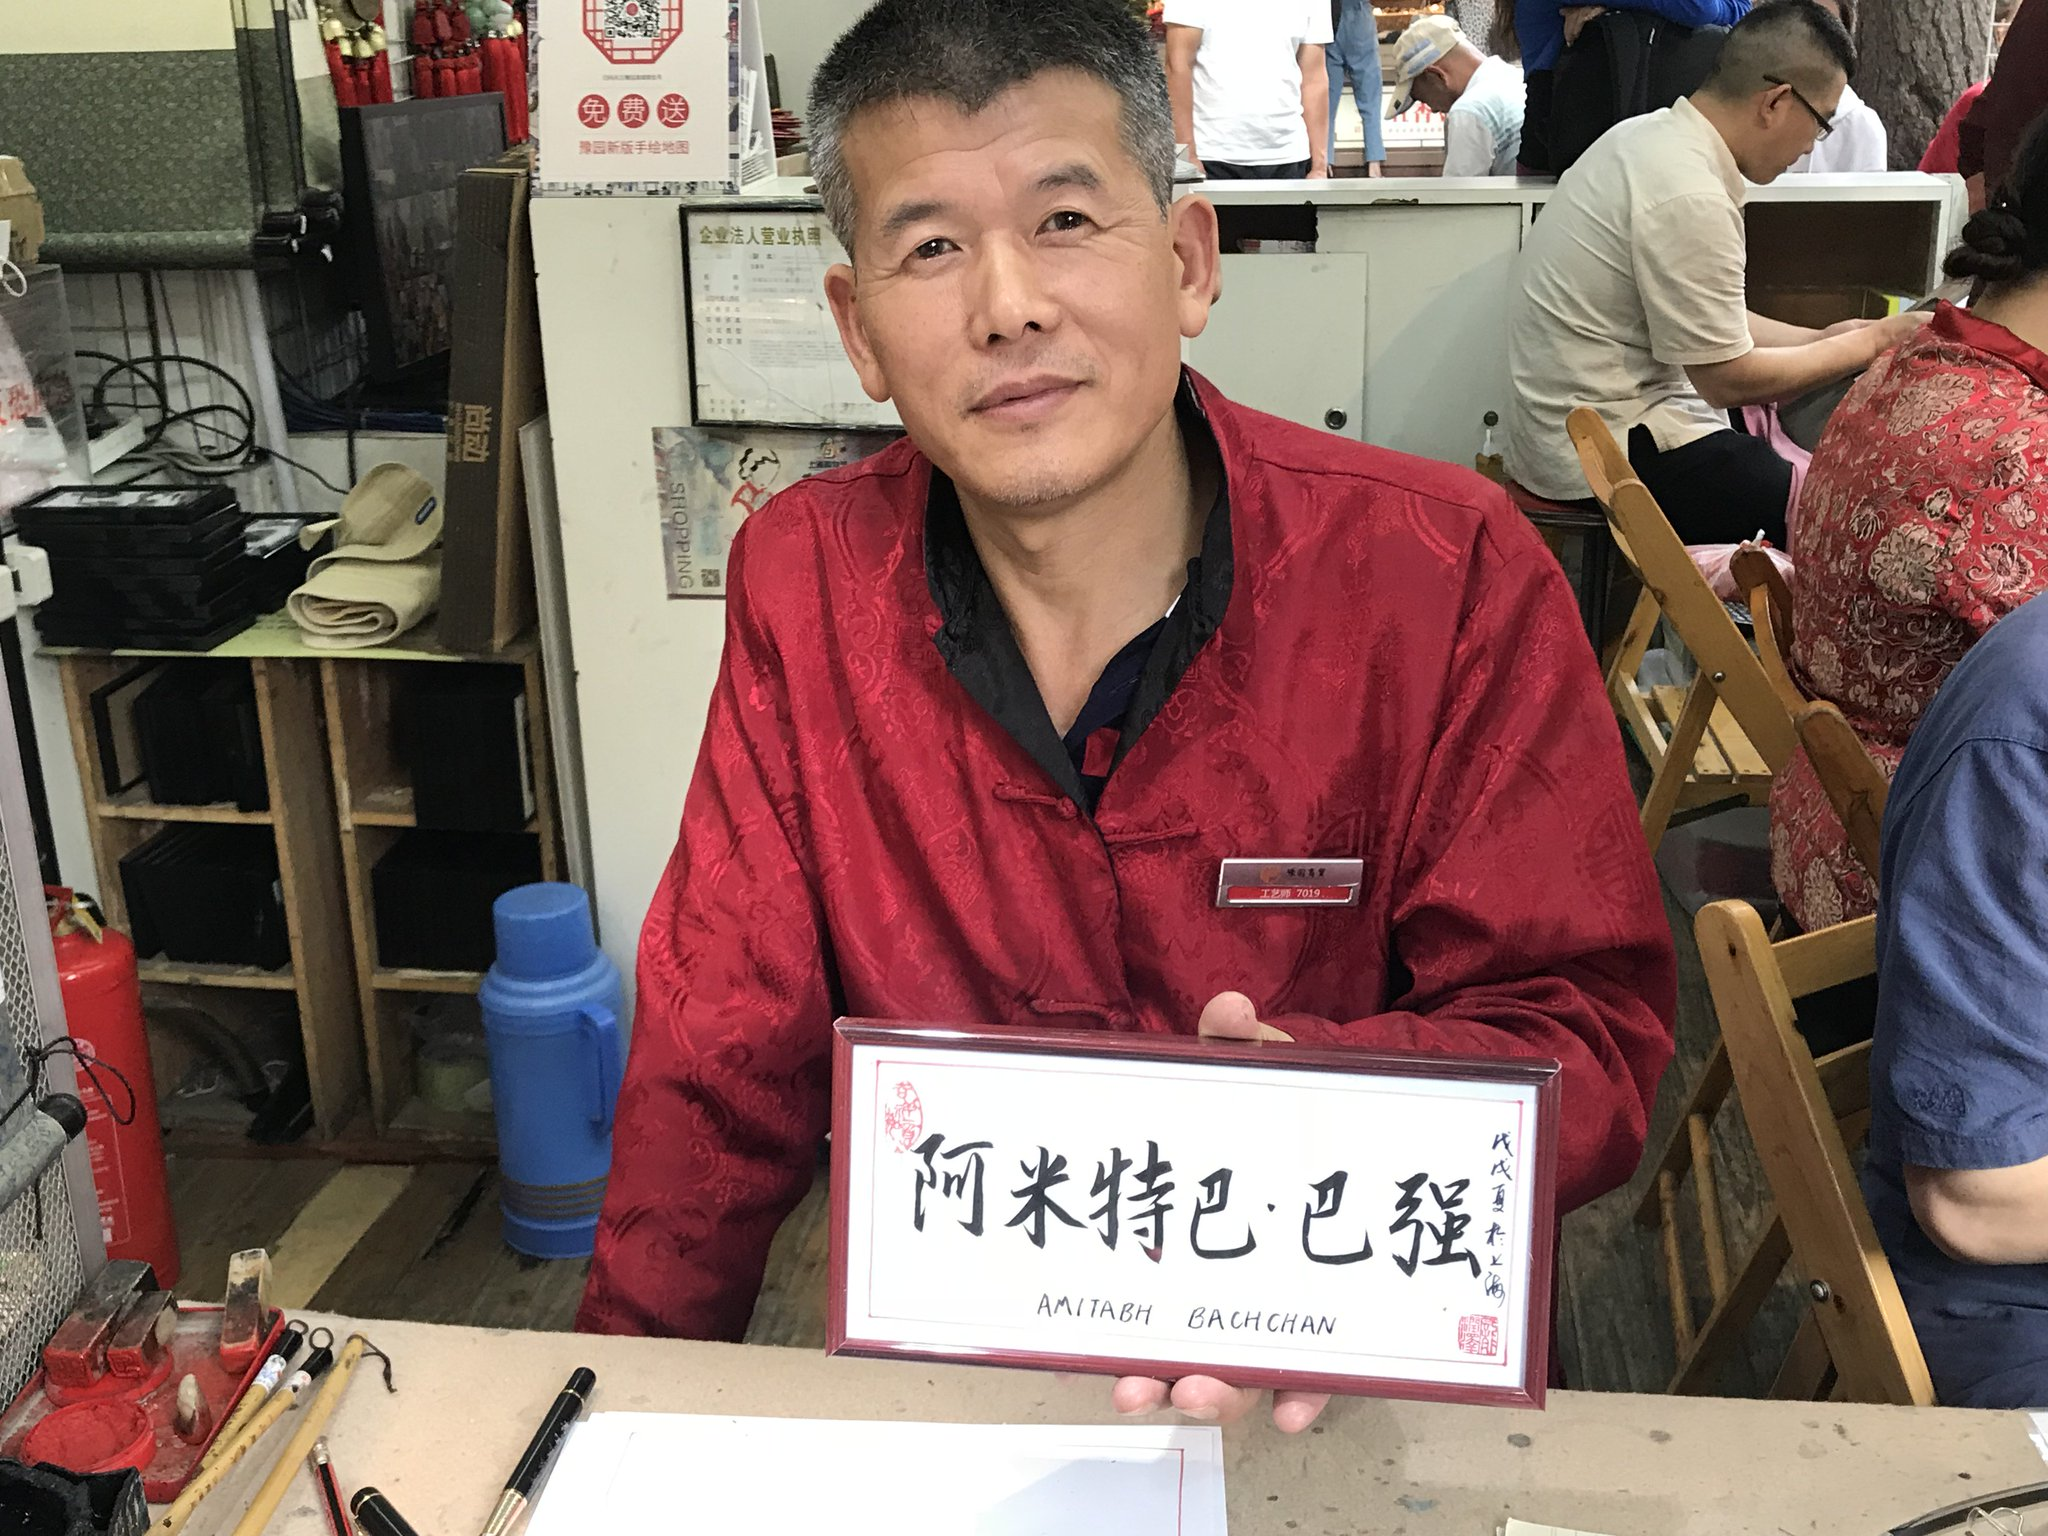 T 2823 - A Chinese calligraphy artist scripts my name .. thank you Kankana .. love ���� https://t.co/SBcij95zFi